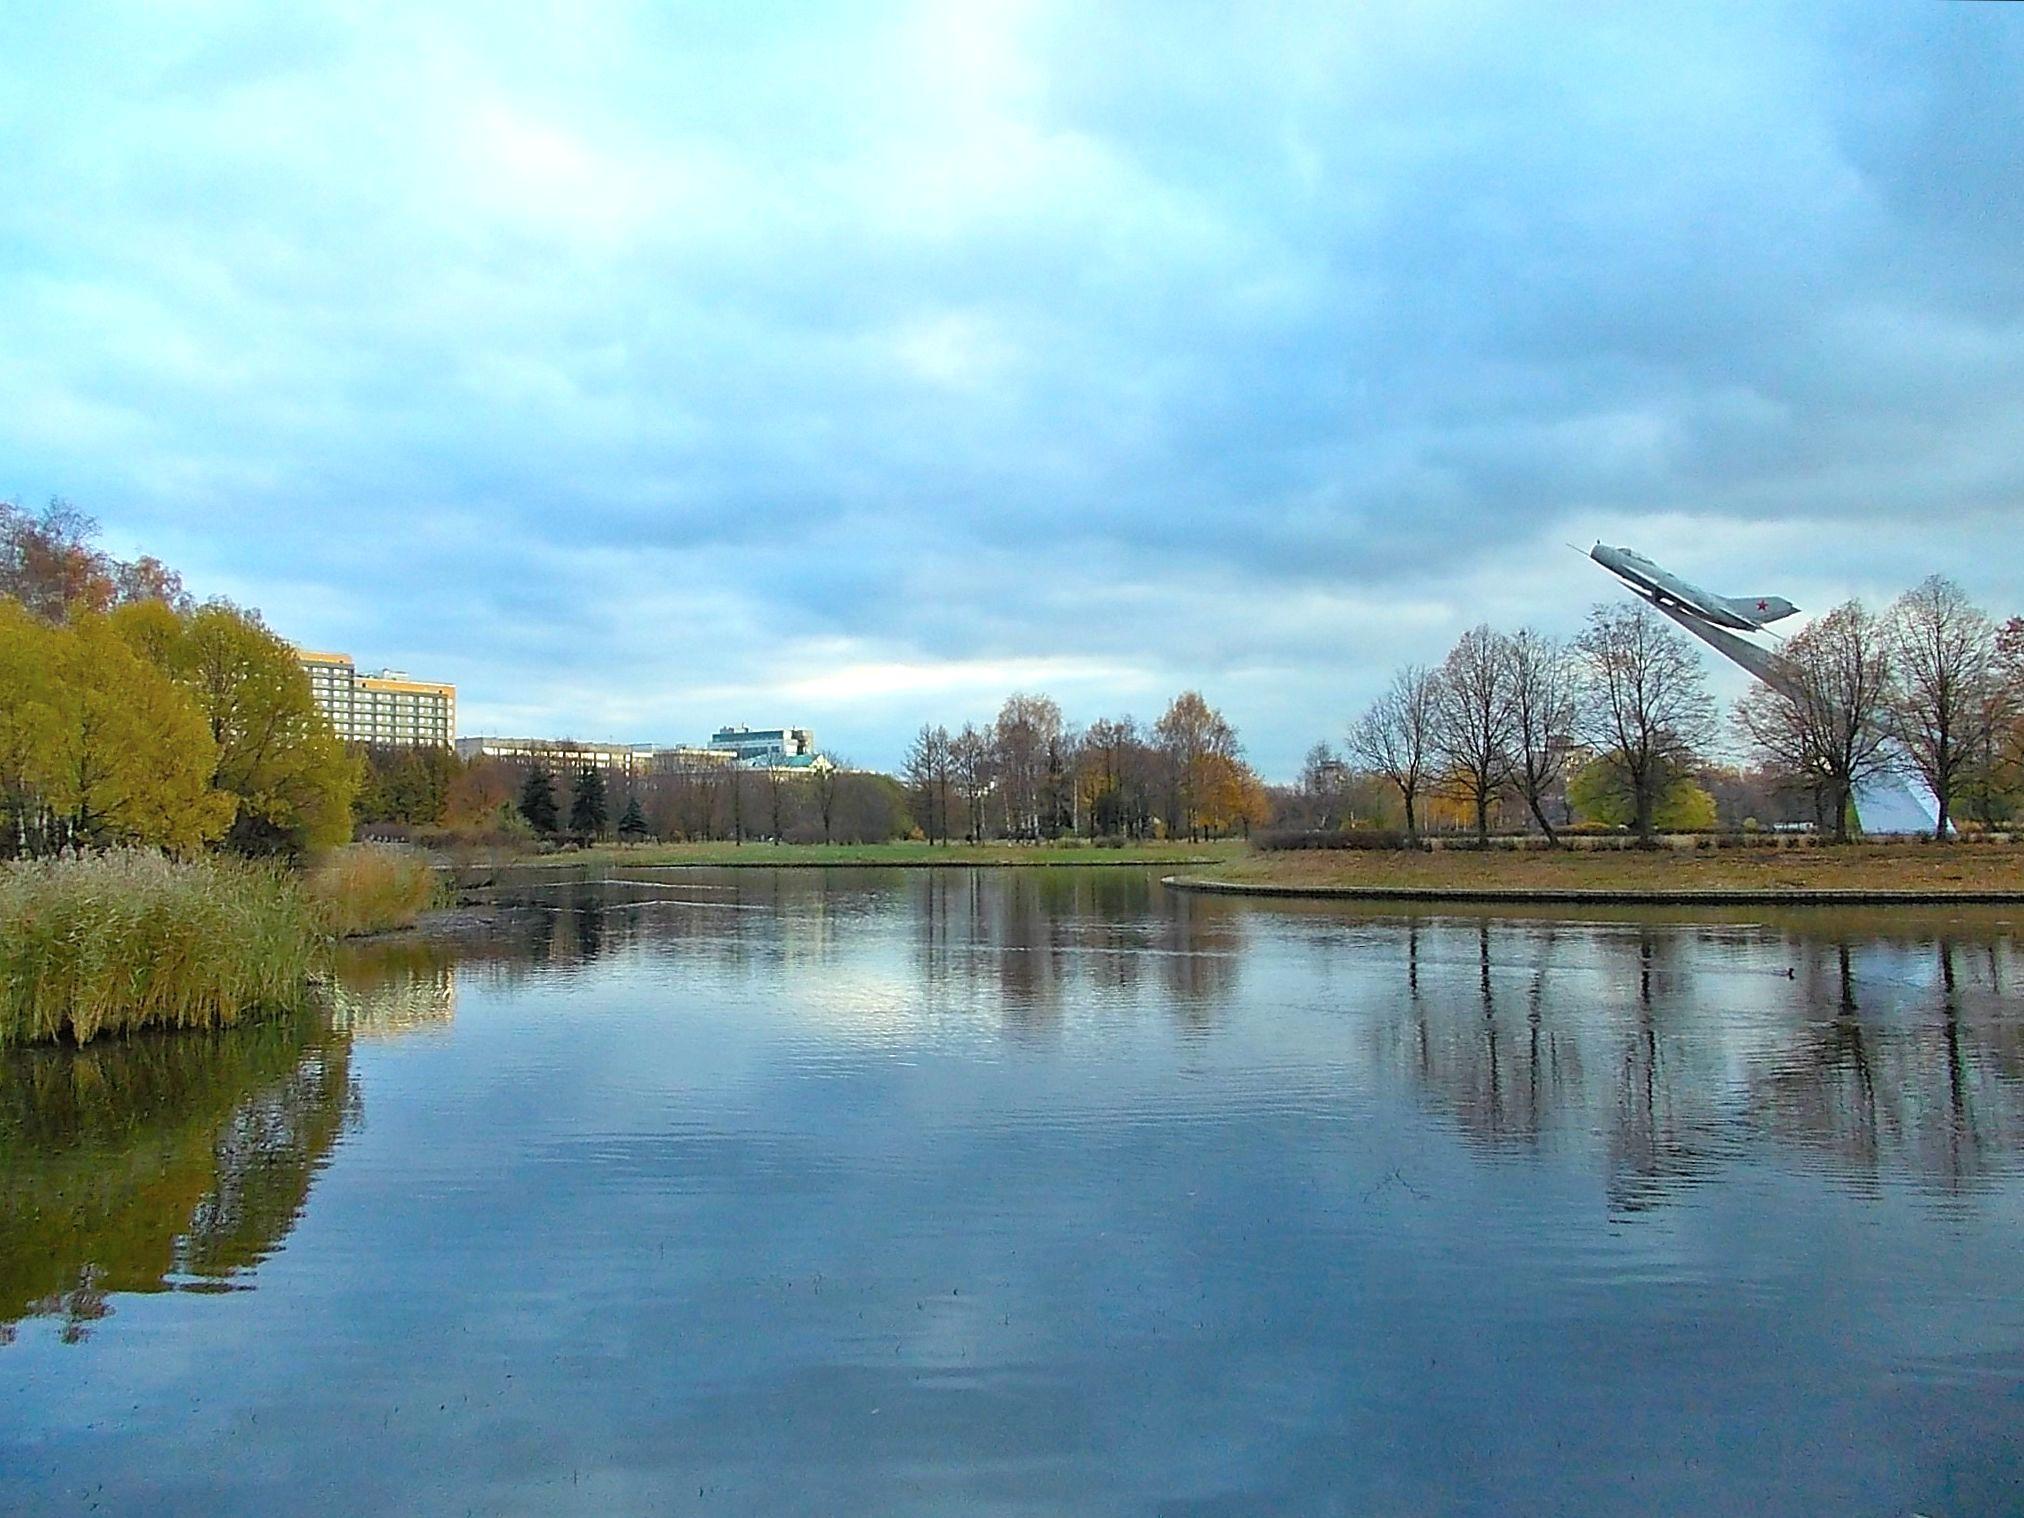 Парк авиаторов фото петербург